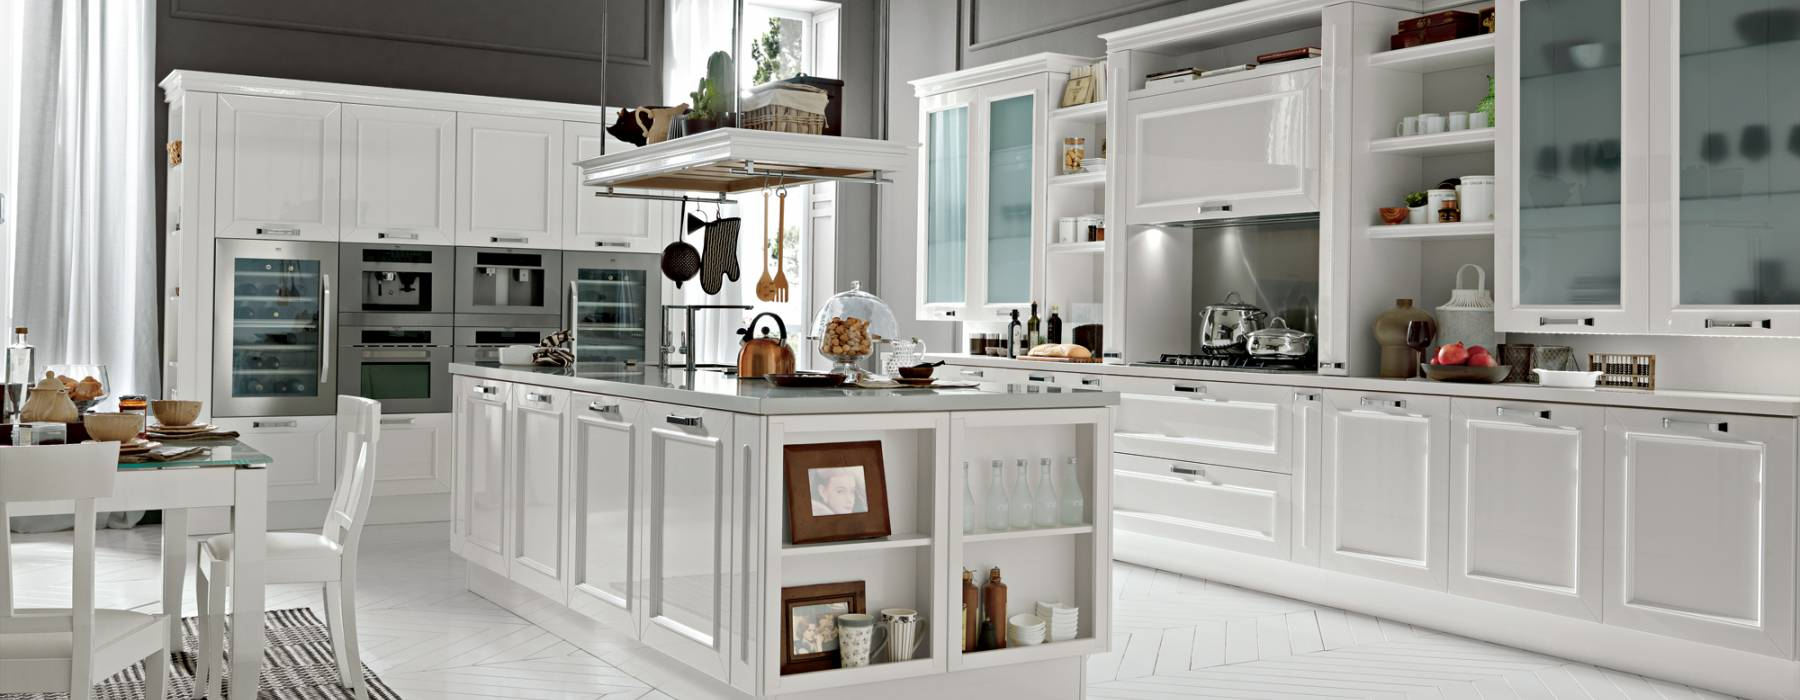 cucina-febal-romantica-total-white – Arredo Casa Roma